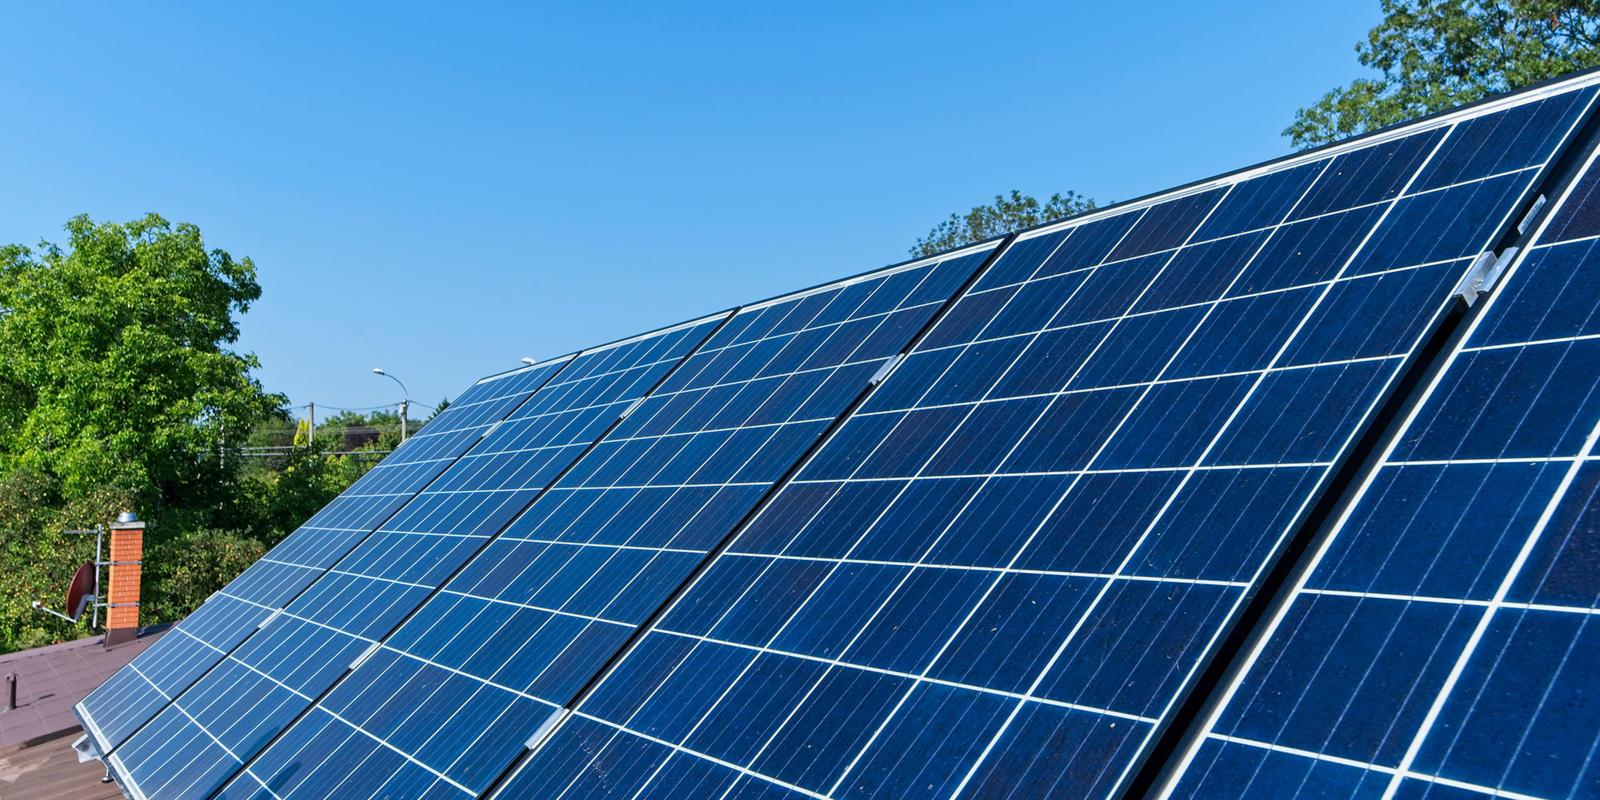 zonnepanelen plat dak plaatsen